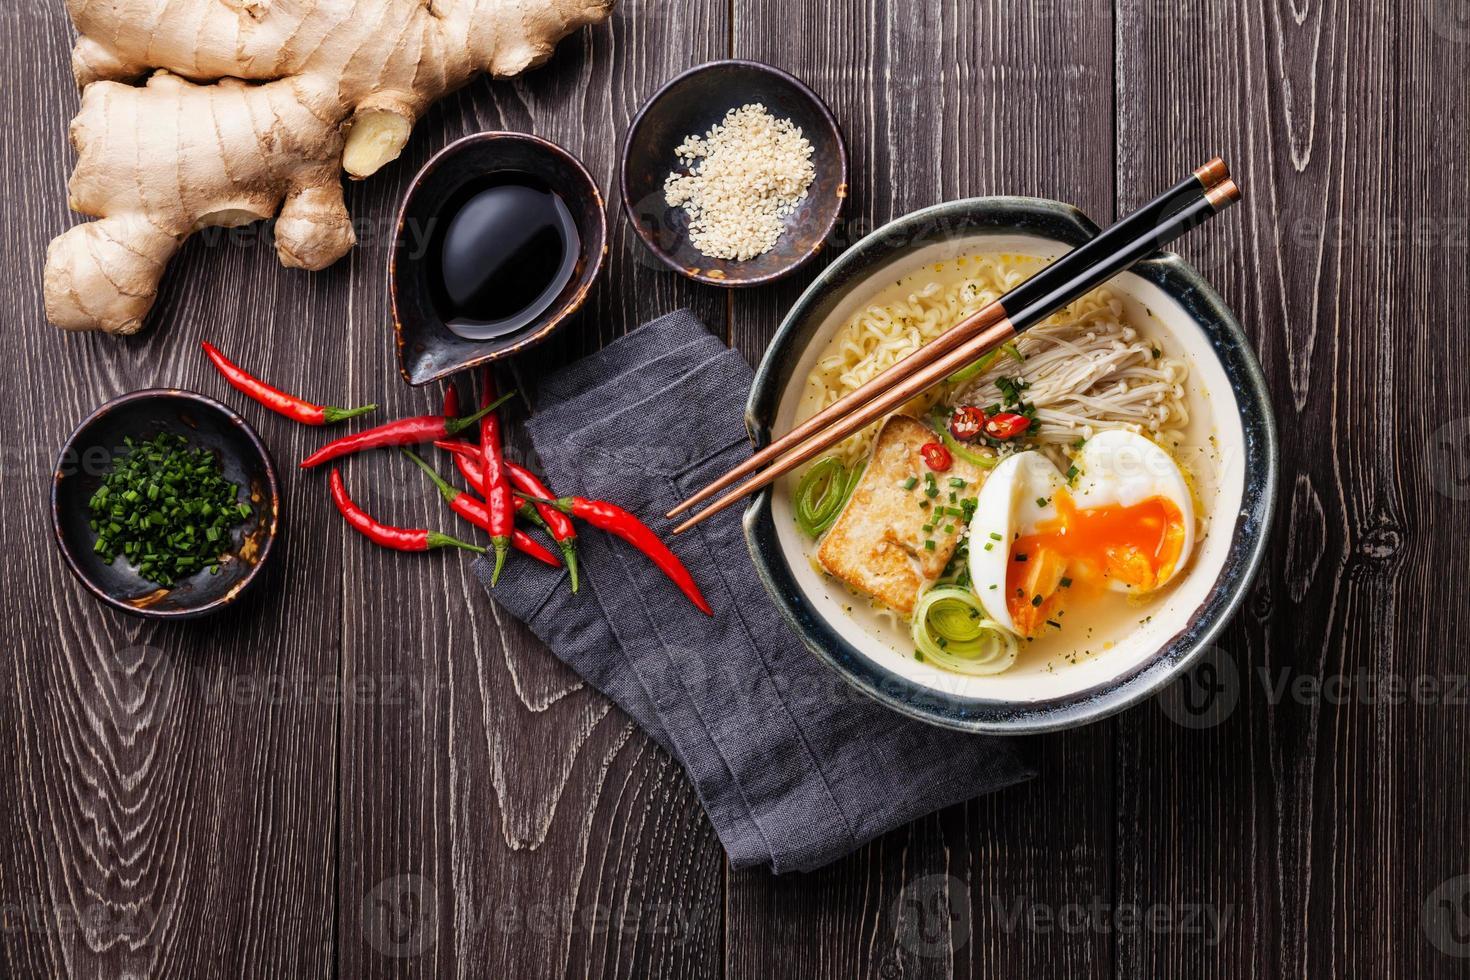 nouilles ramen au miso asiatique avec oeuf, tofu et enoki photo